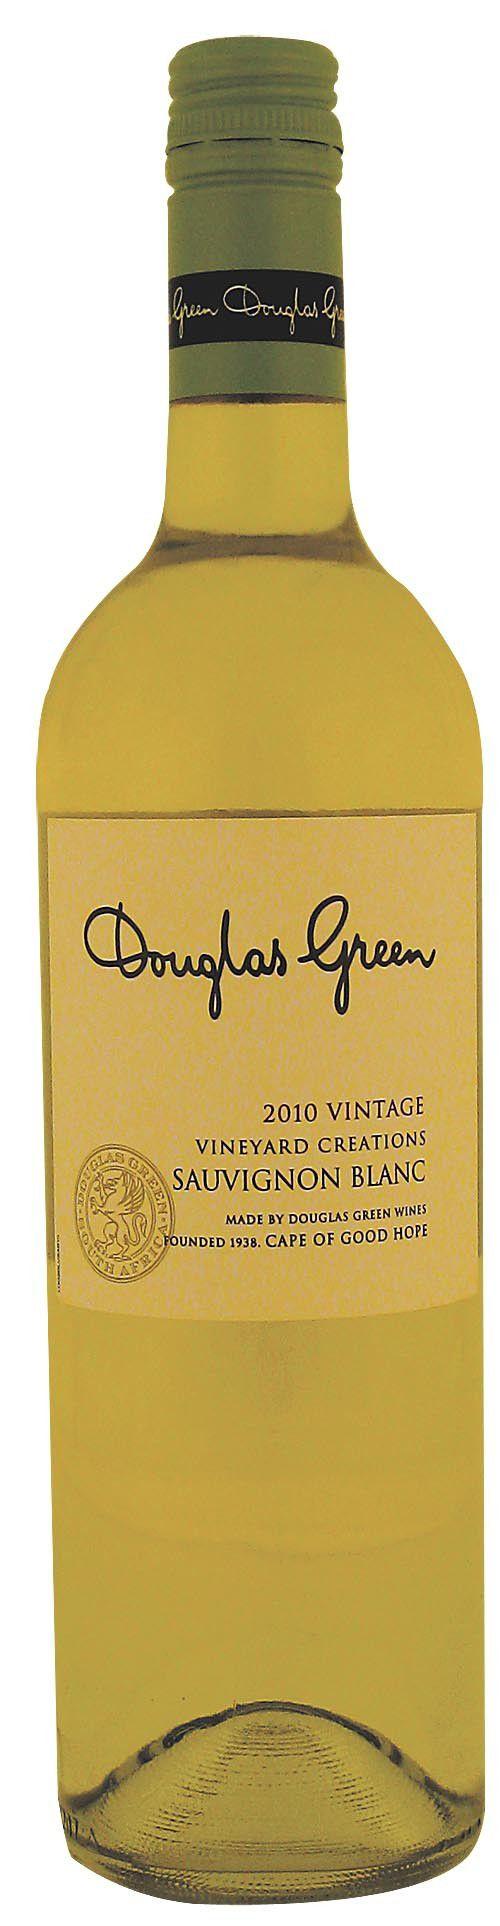 2009 Douglas Green Sauvignon Blanc_lowres